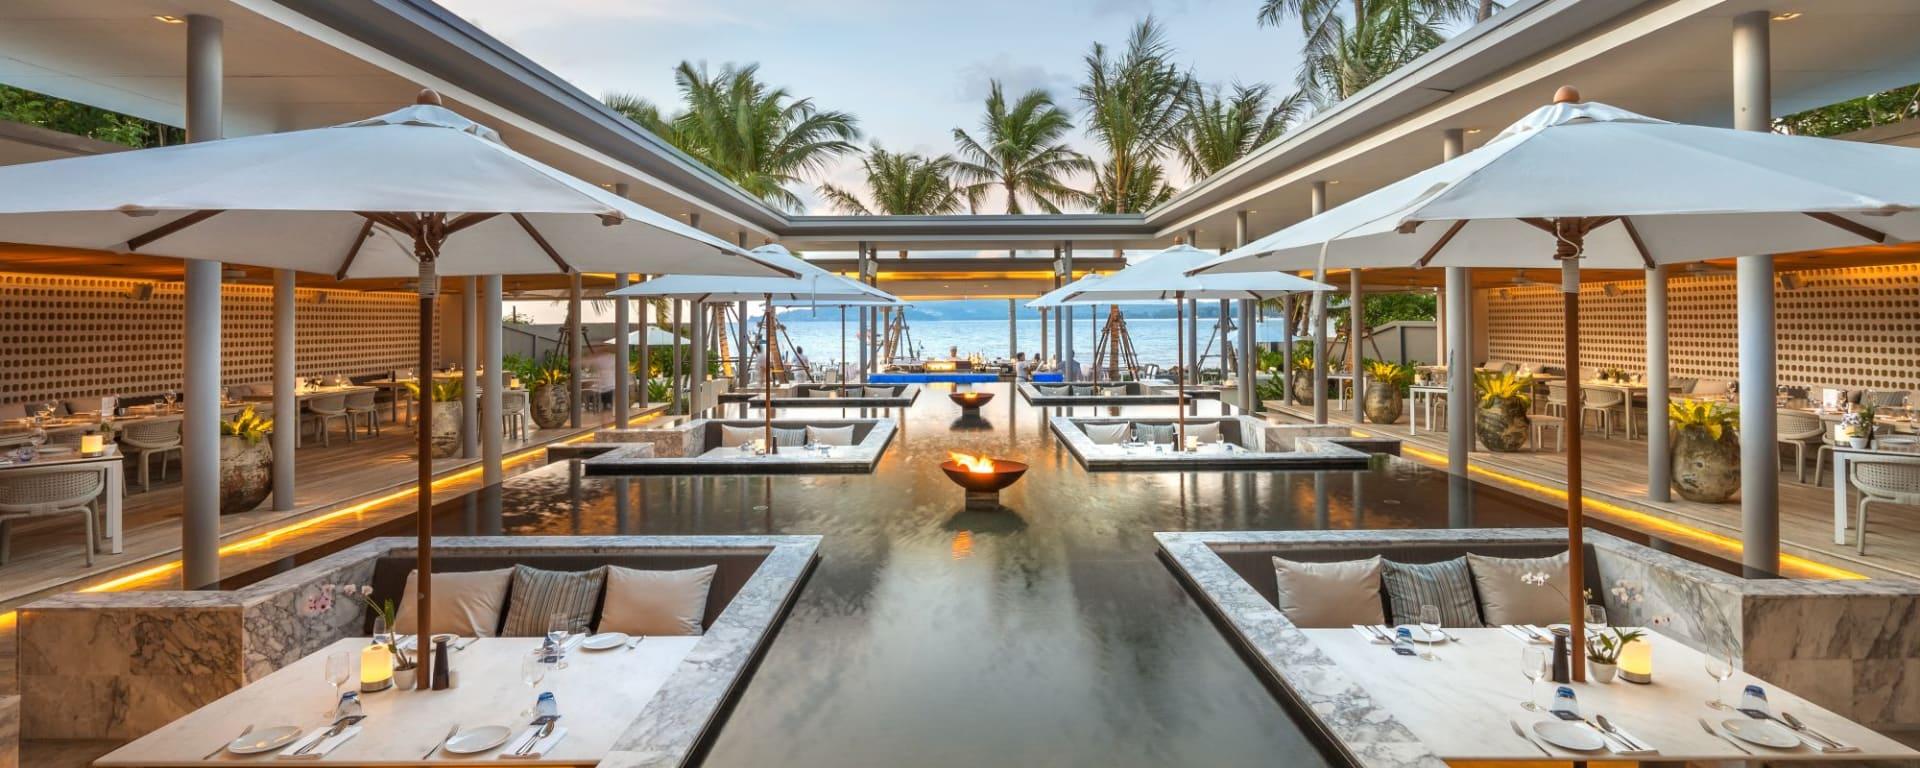 Twinpalms Phuket: Palm Seaside Restaurant Lounge & Bar